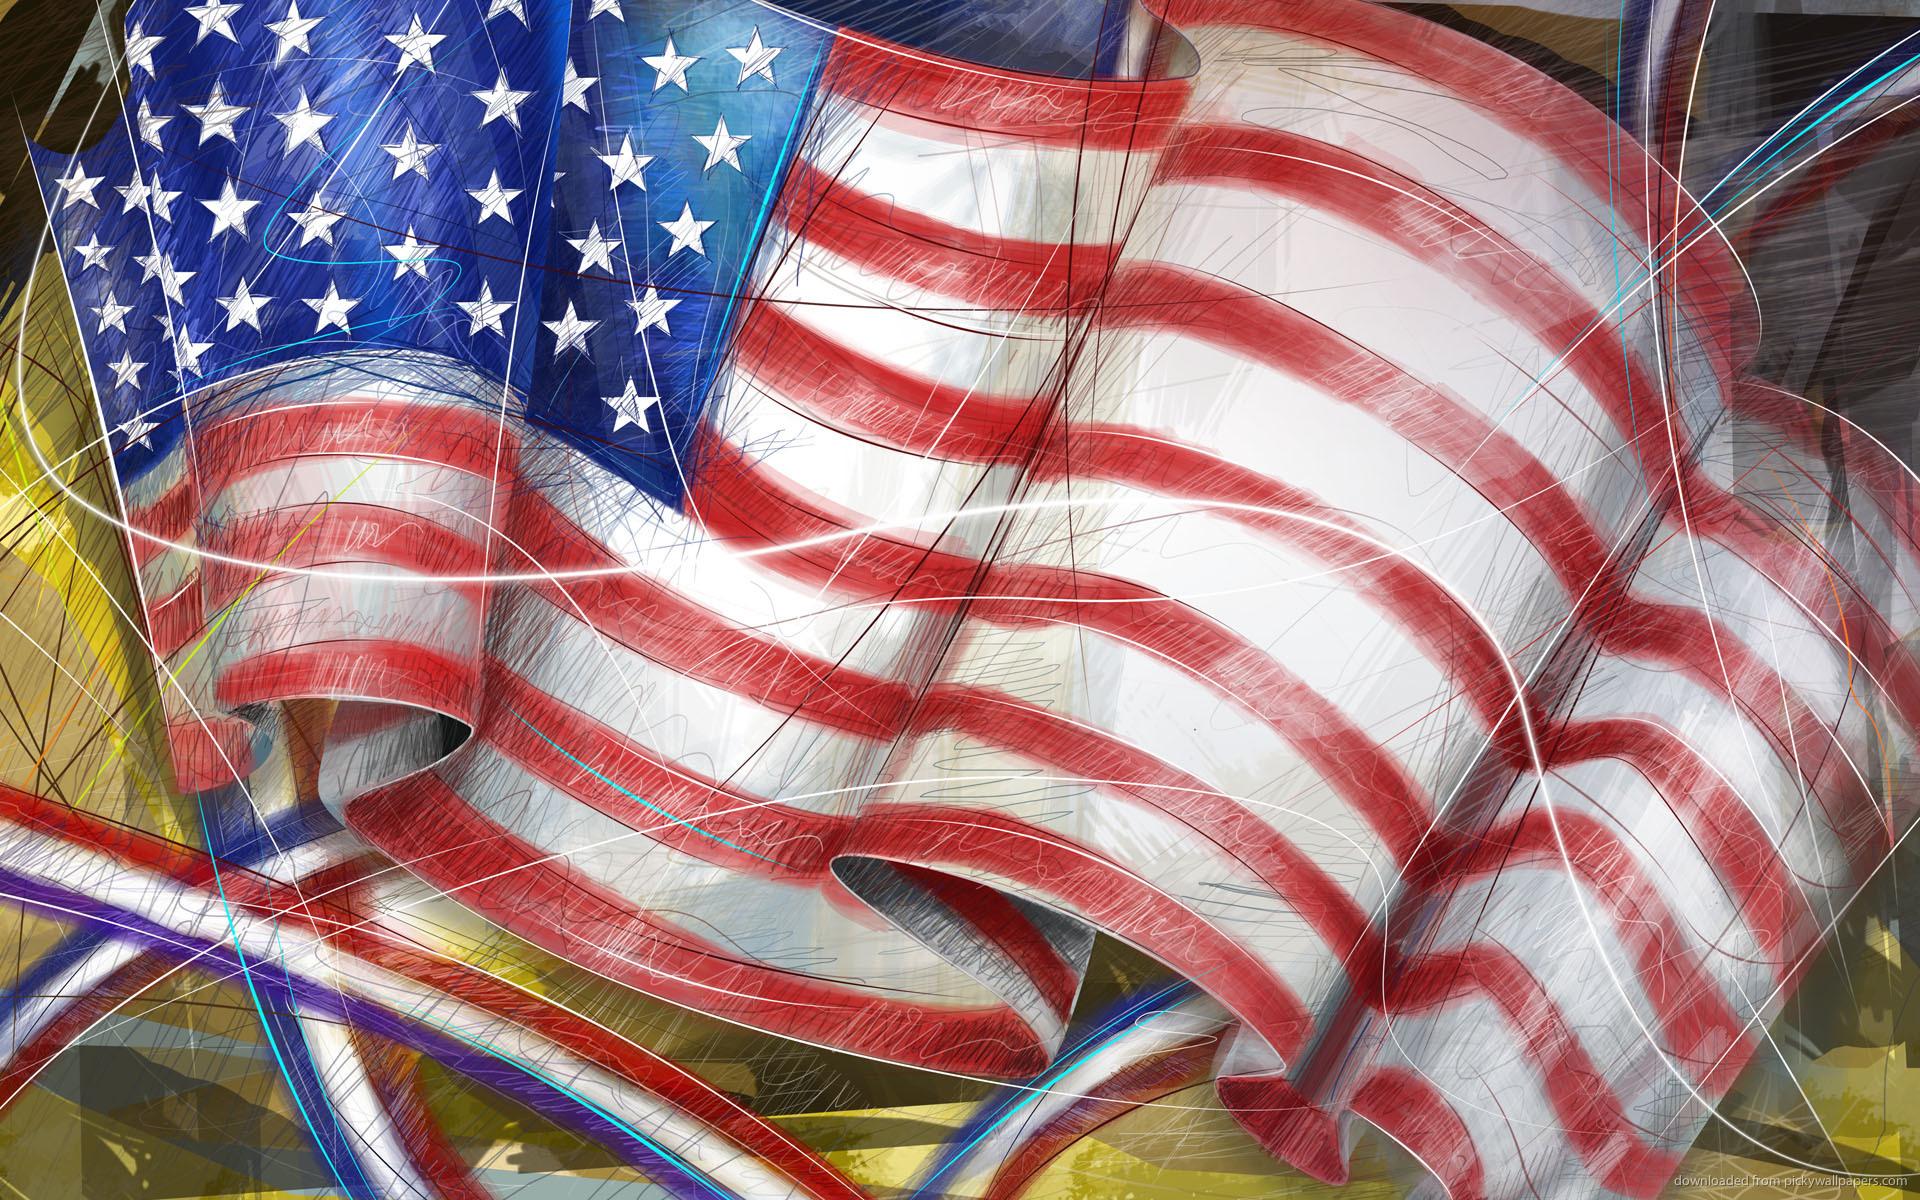 Drawn american flag Drawn Wallpaper flag 1920x1200 Download